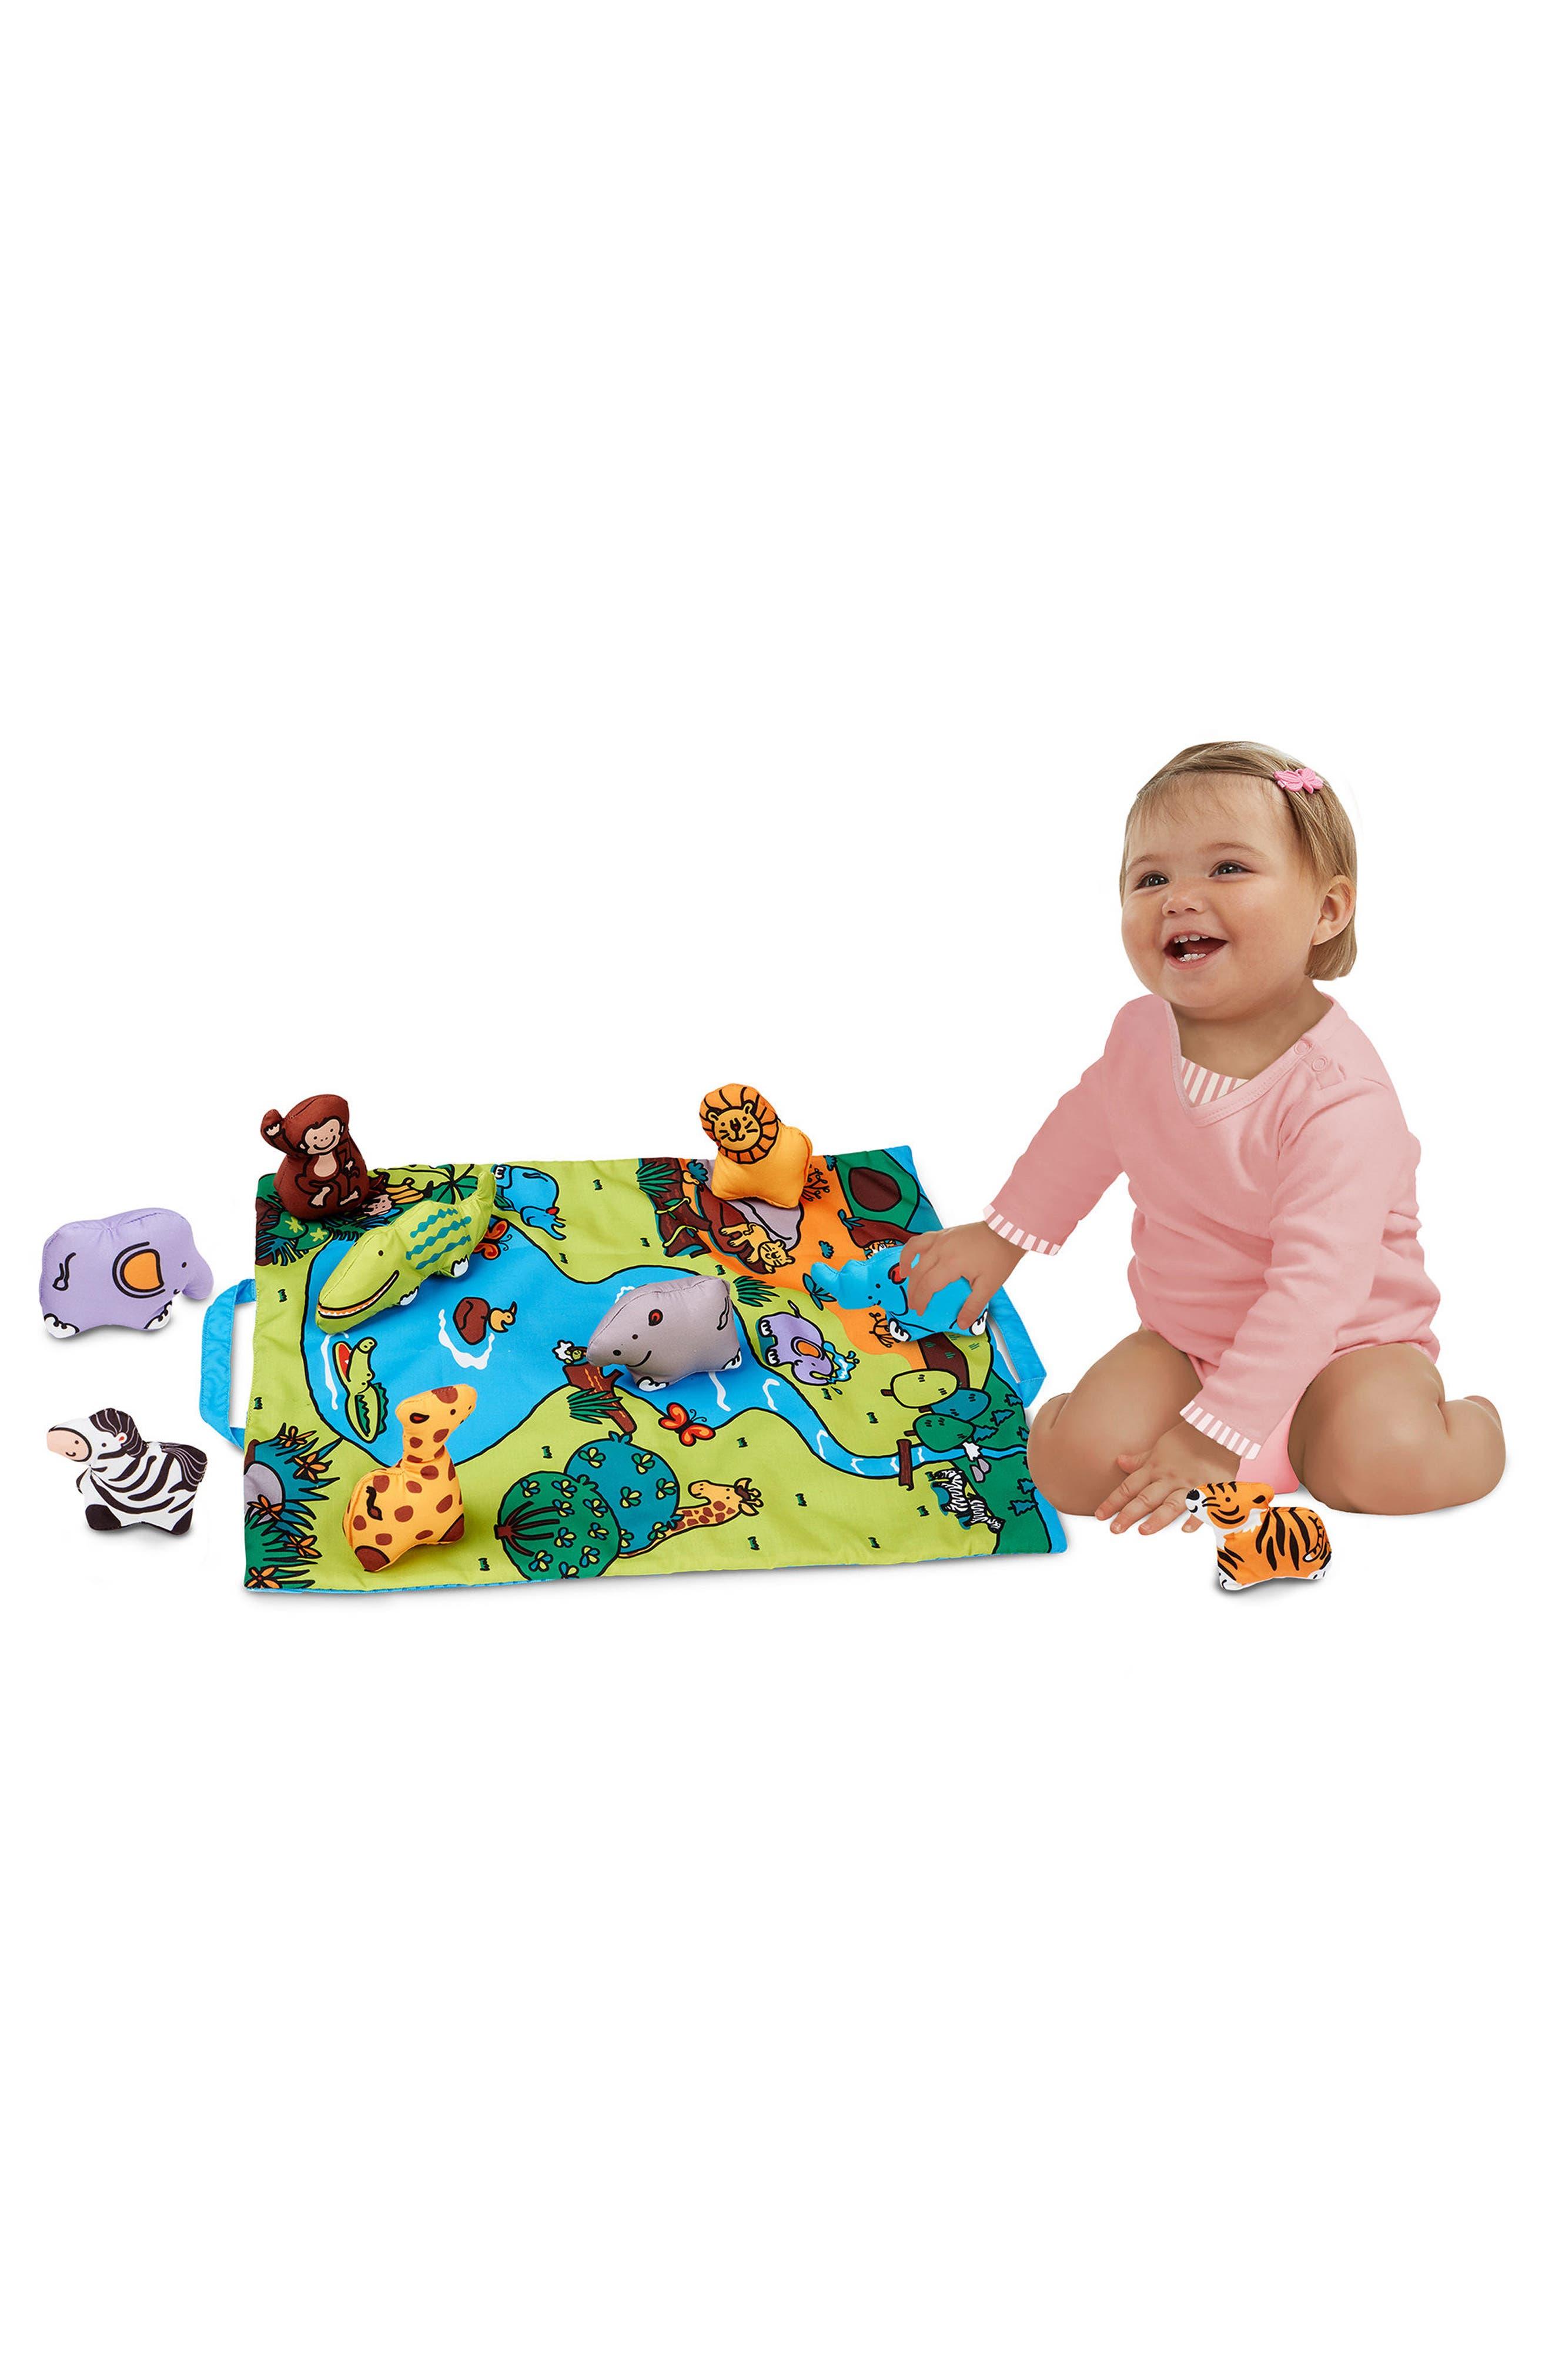 Take-Along Safari Play Mat,                             Alternate thumbnail 2, color,                             Beige